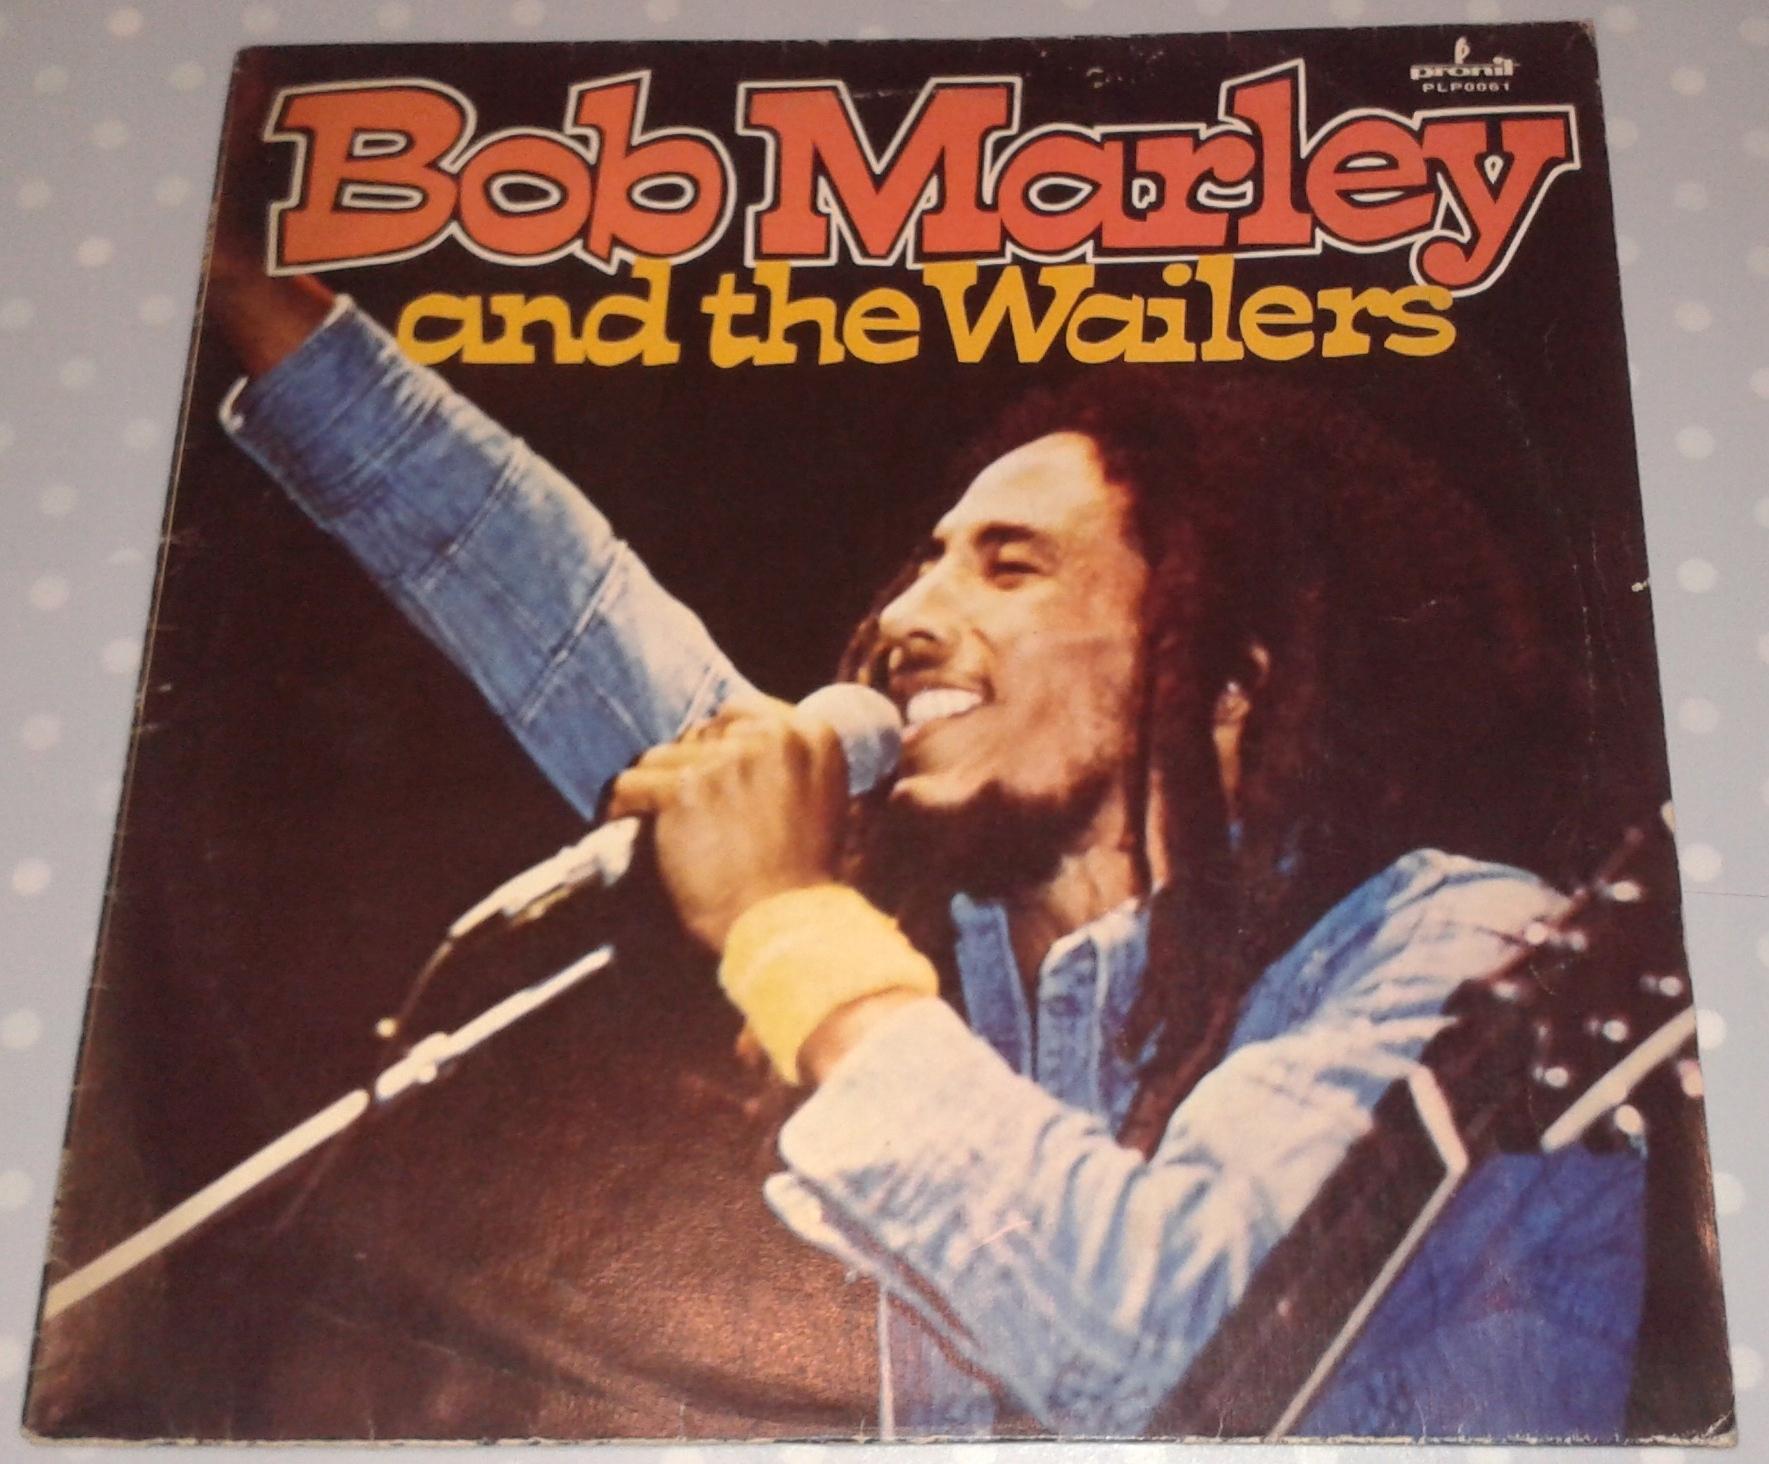 Bob Marley and the Wailers płyta winylowa